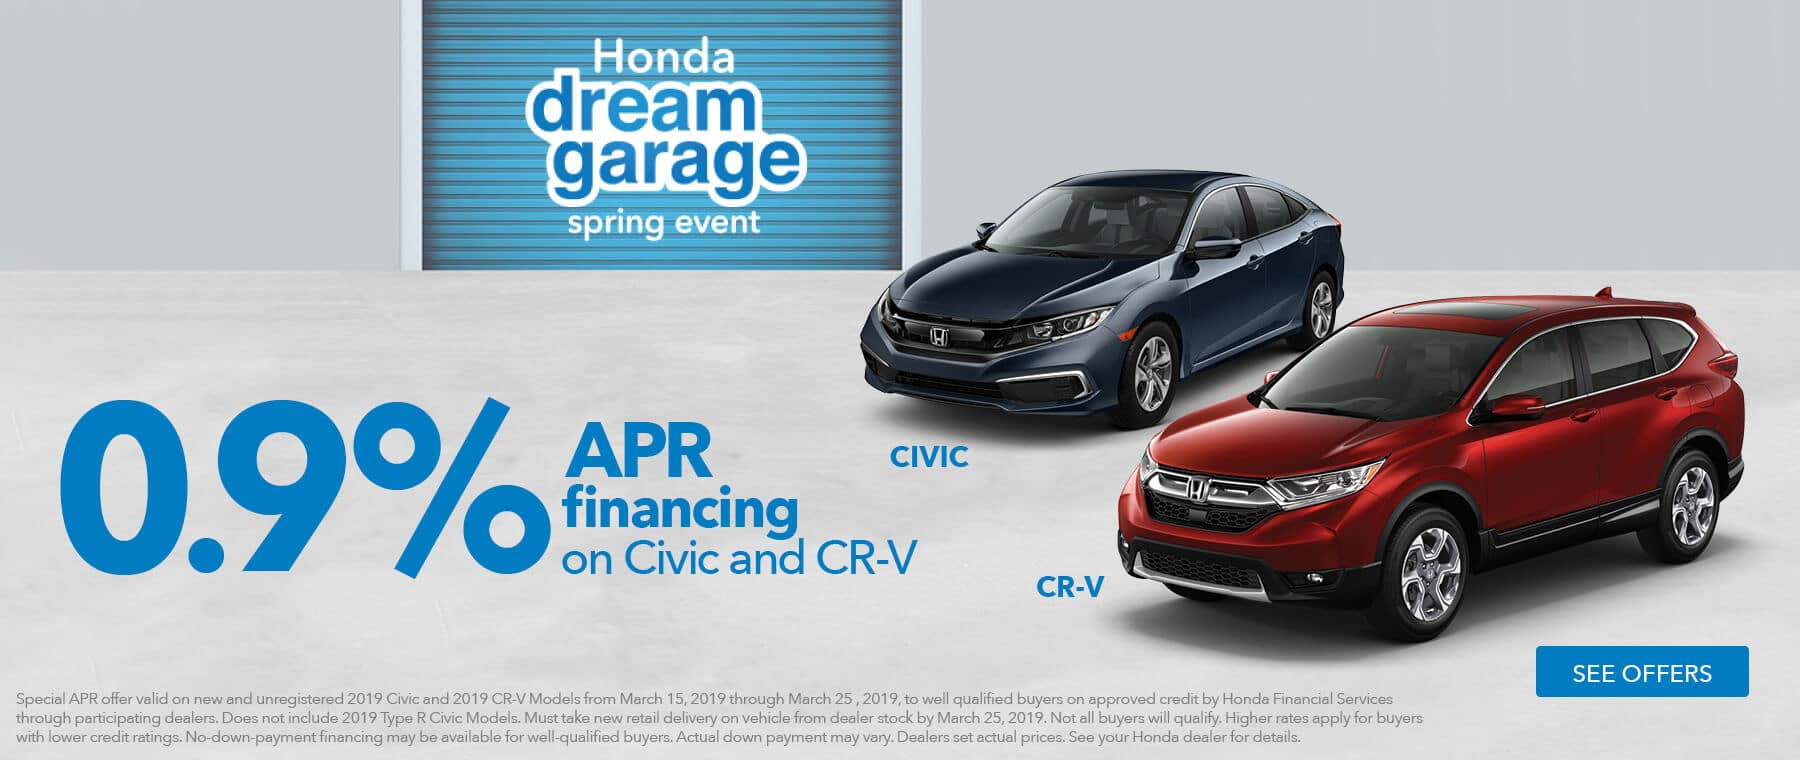 Detroit Area Honda Dealers 2019 Honda Dream Garage APR Financing HP Slide